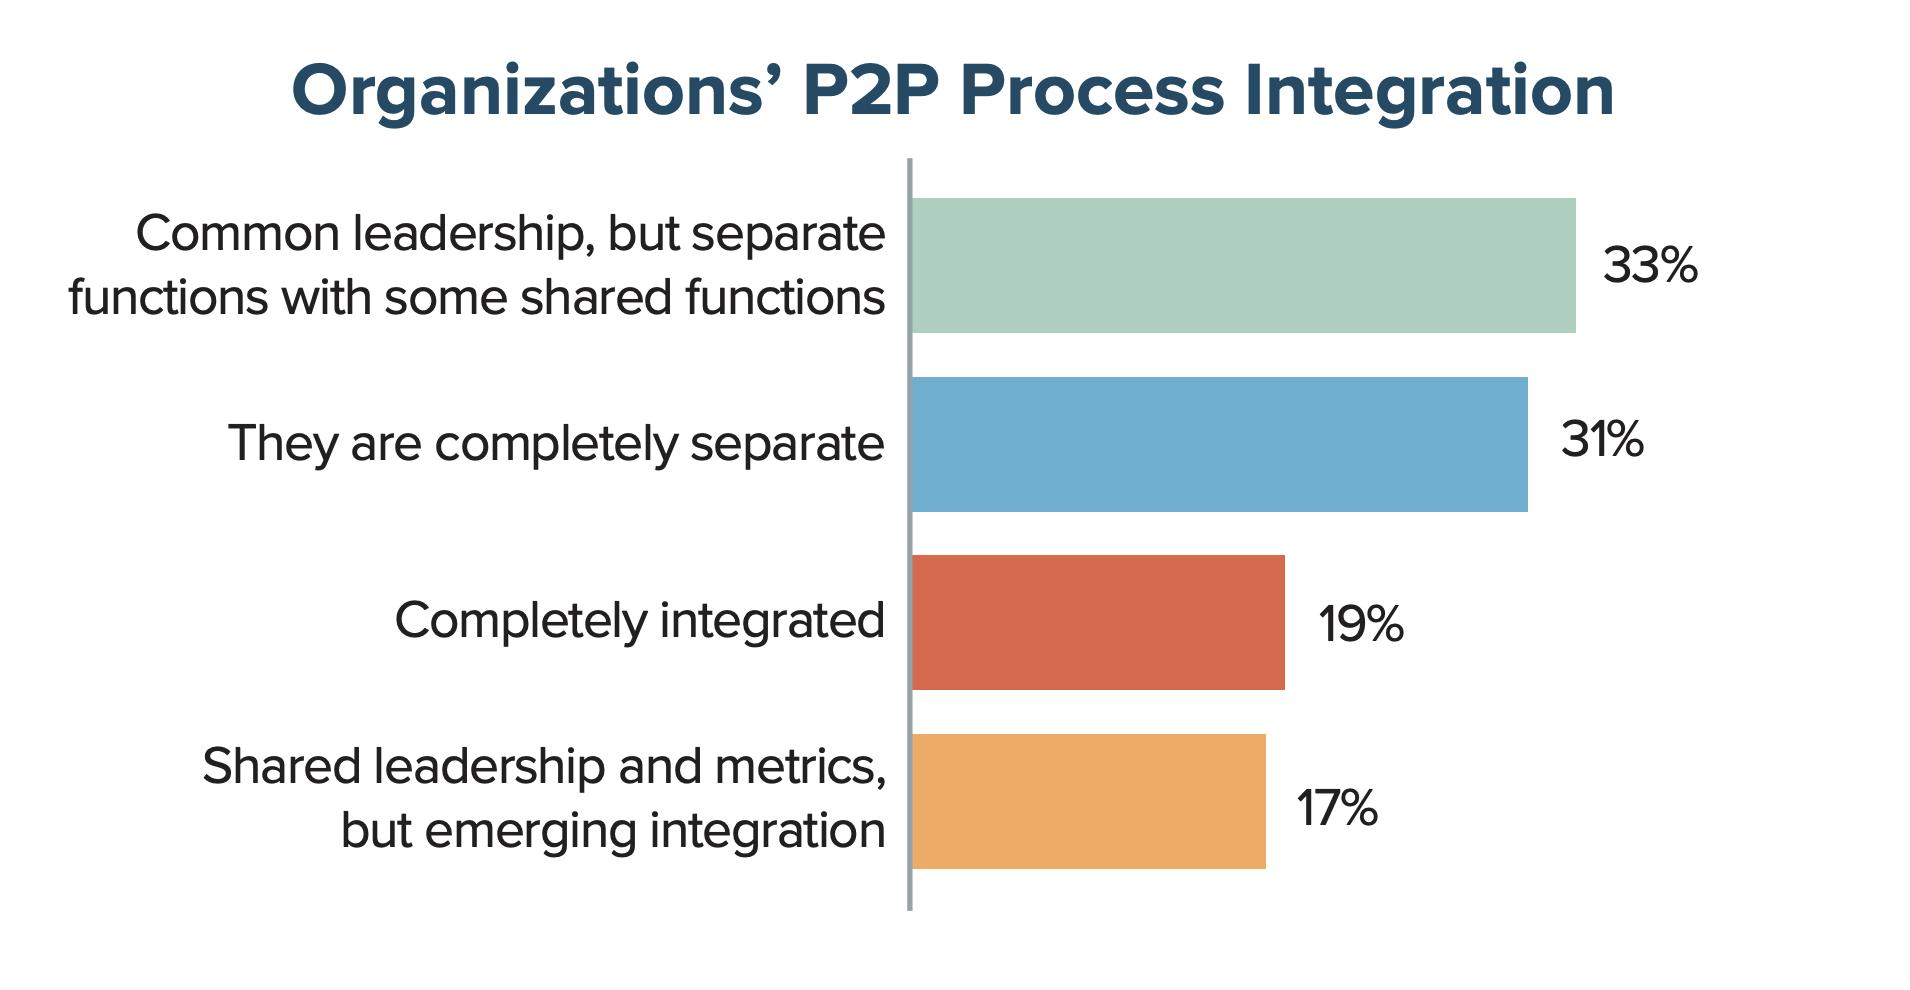 Organizations' P2P Process Integration